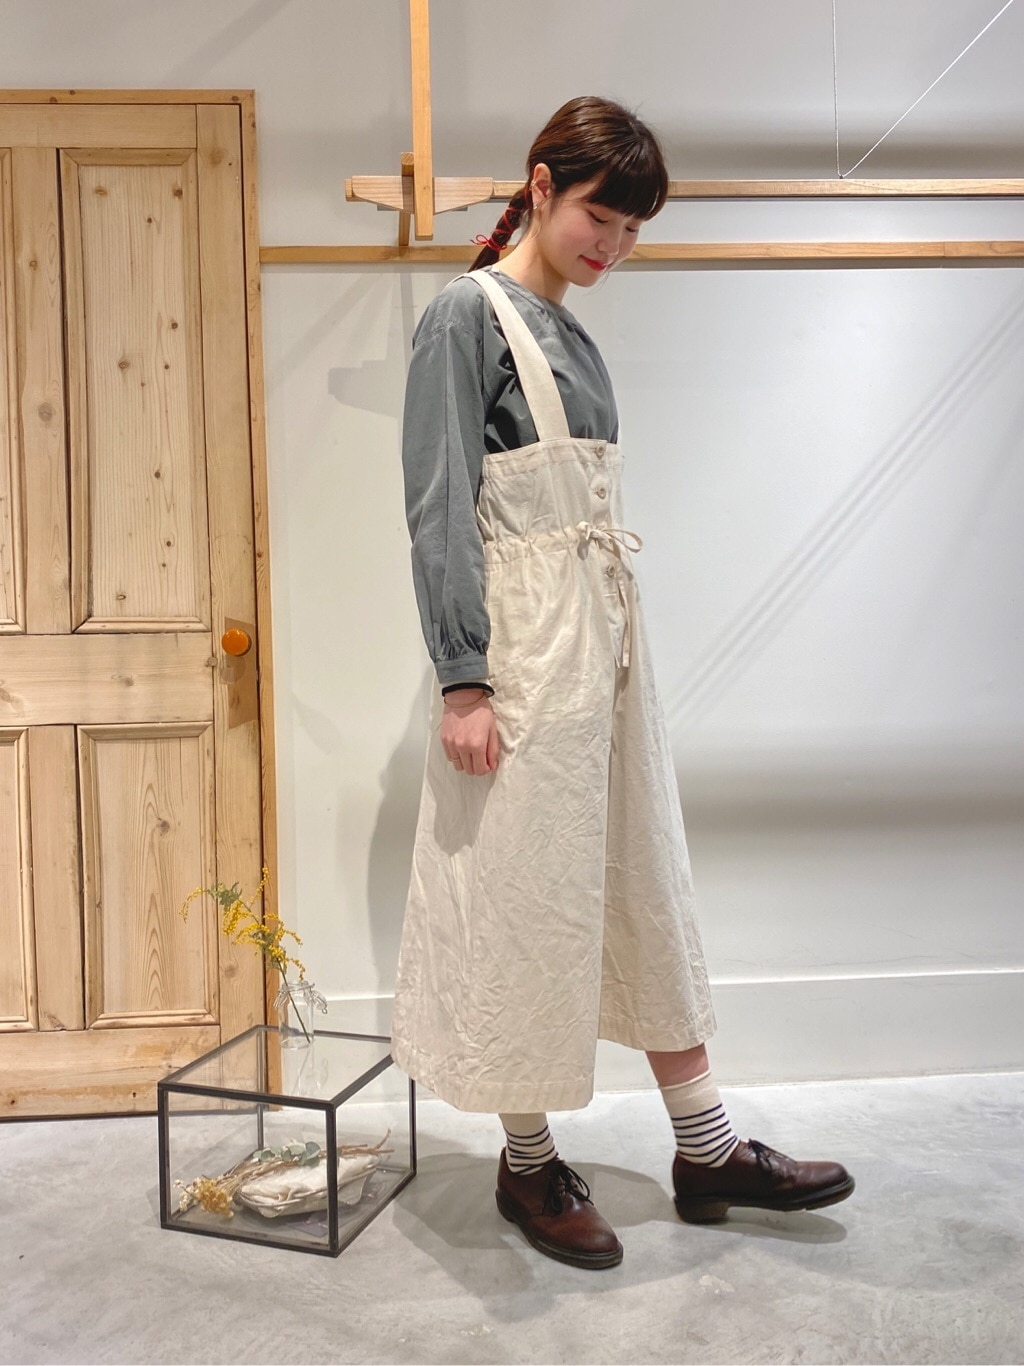 Malle chambre de charme 調布パルコ 身長:167cm 2020.03.10